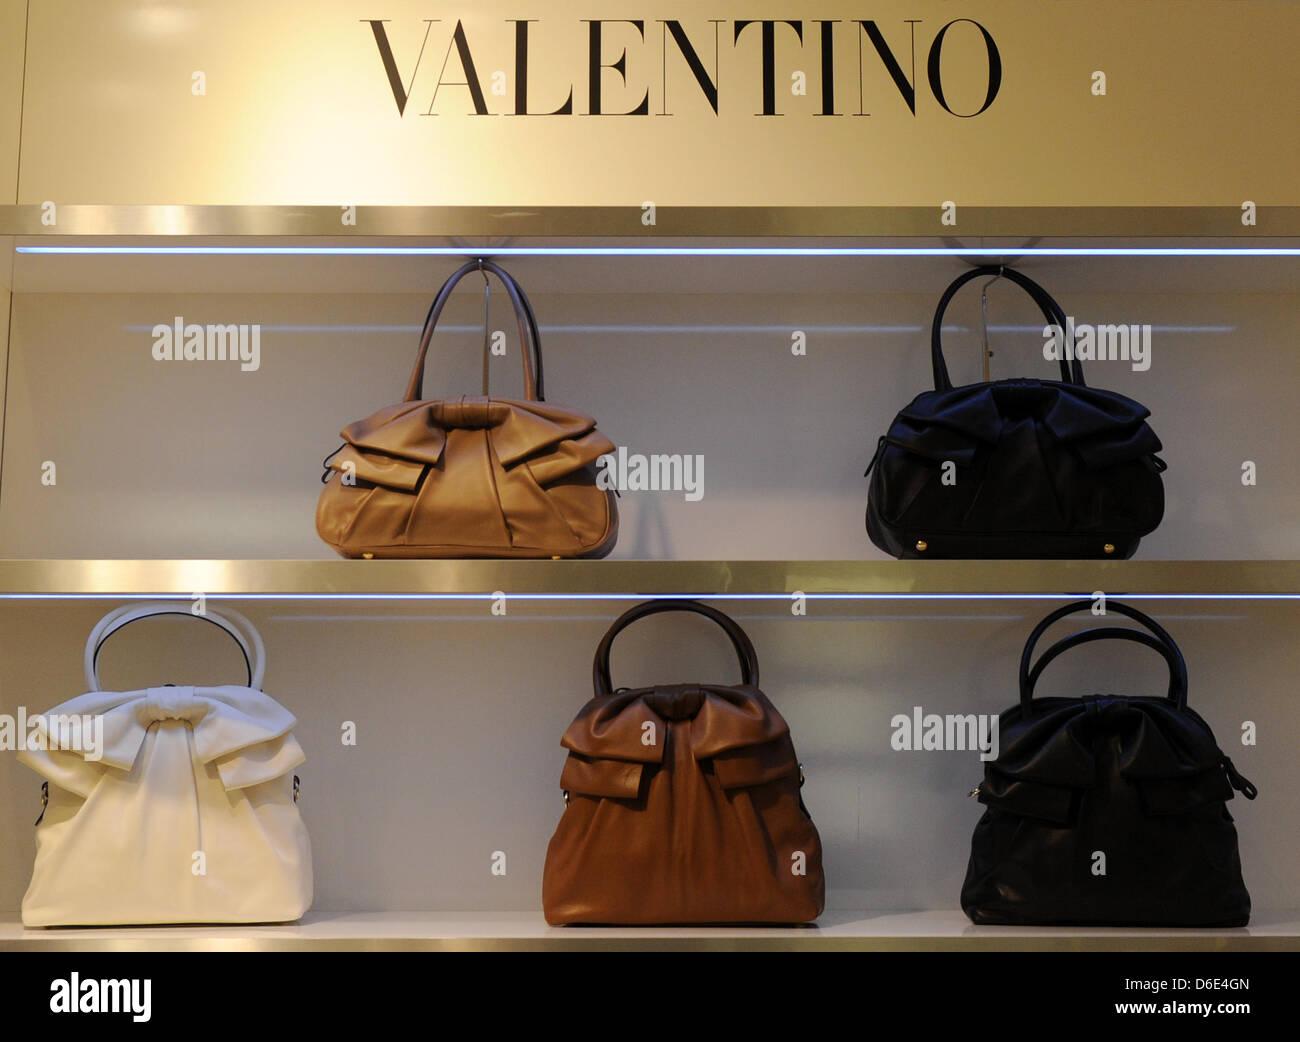 Handbags of luxury brand Valentino, pictured on 18 January 2012 in Berlin, Germany. Foto: Jens Kalaene dpa/lbn - Stock Image